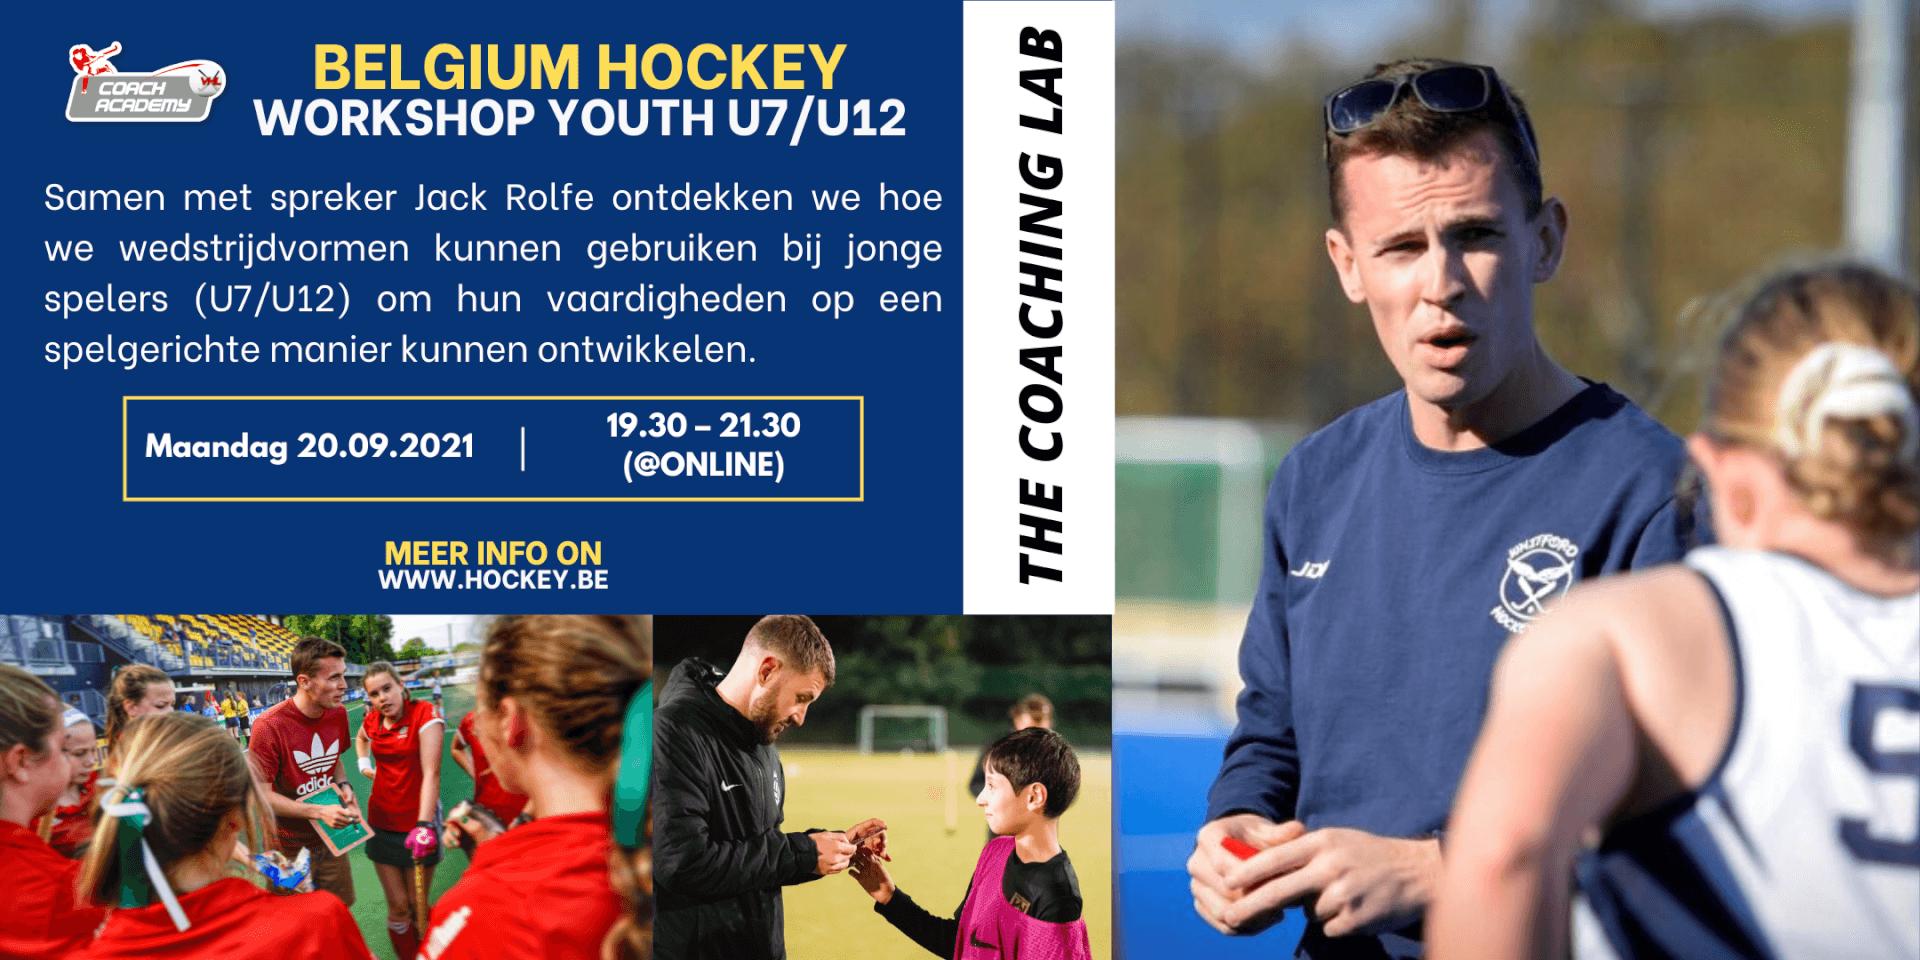 Belgium Hockey Workshop Youth U7U12(1)